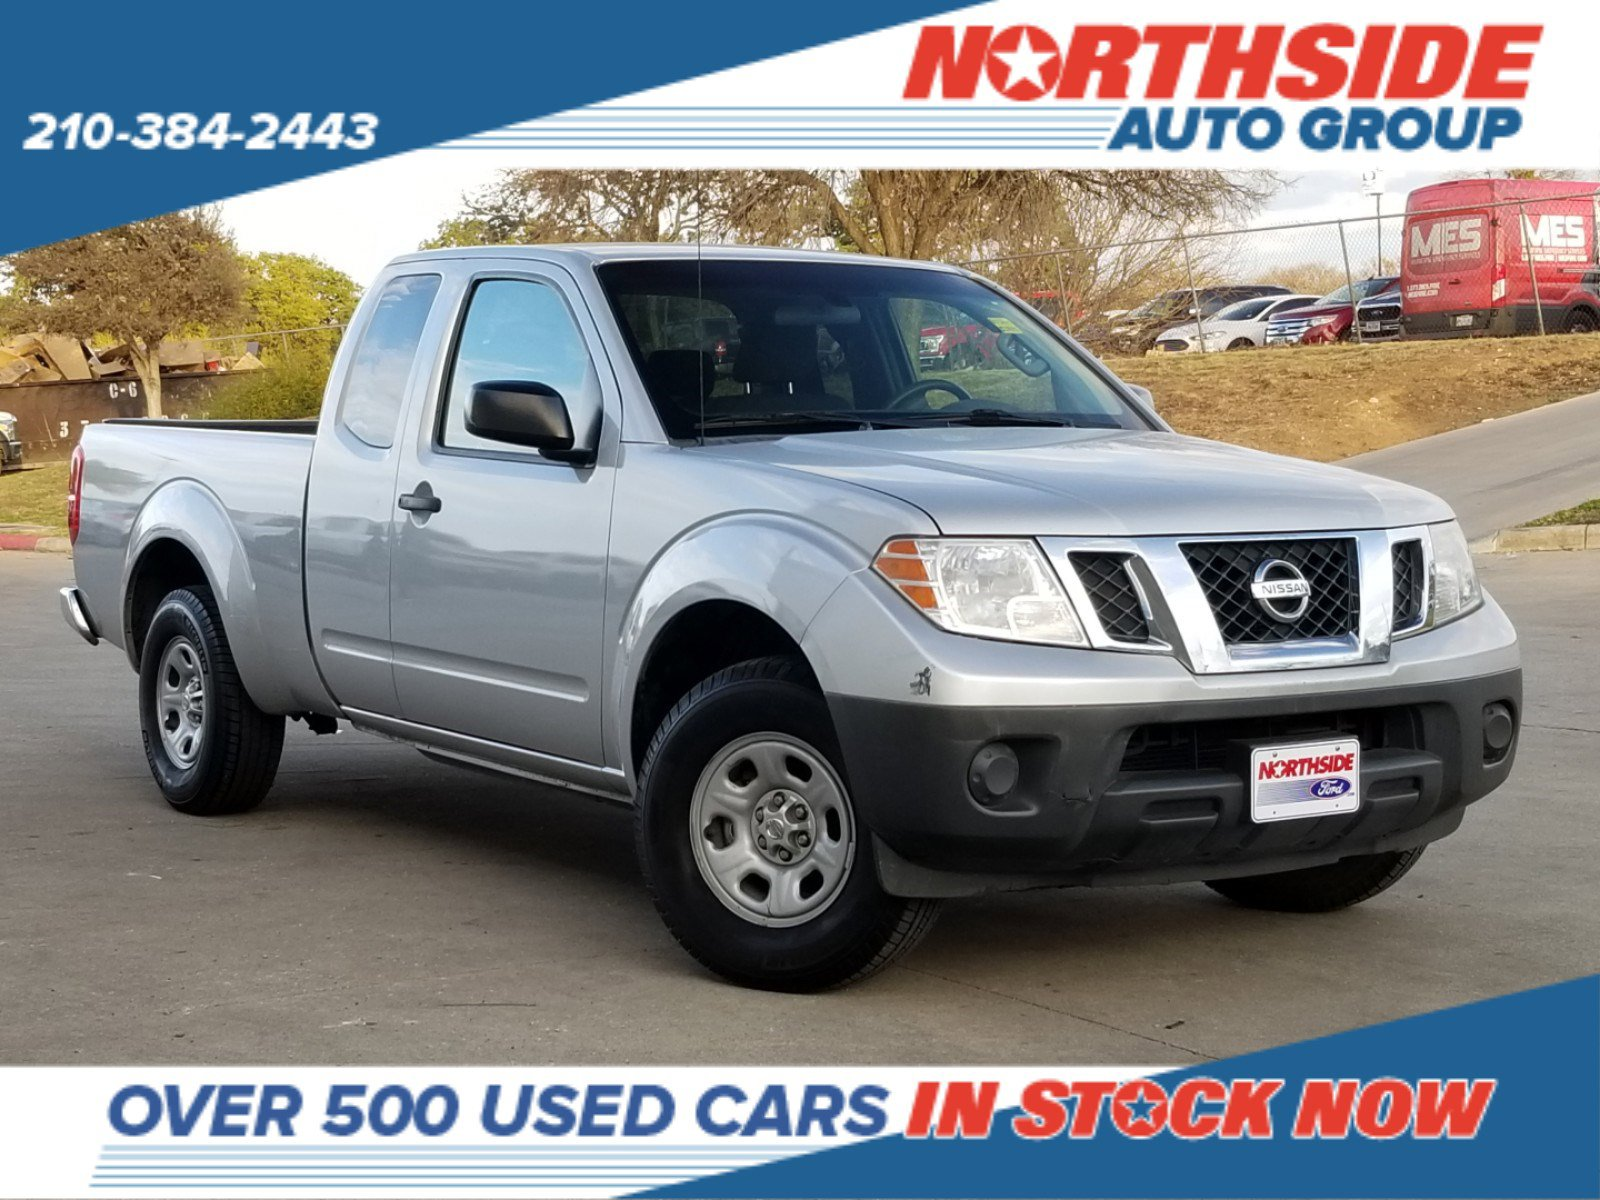 2013 Nissan Frontier S image